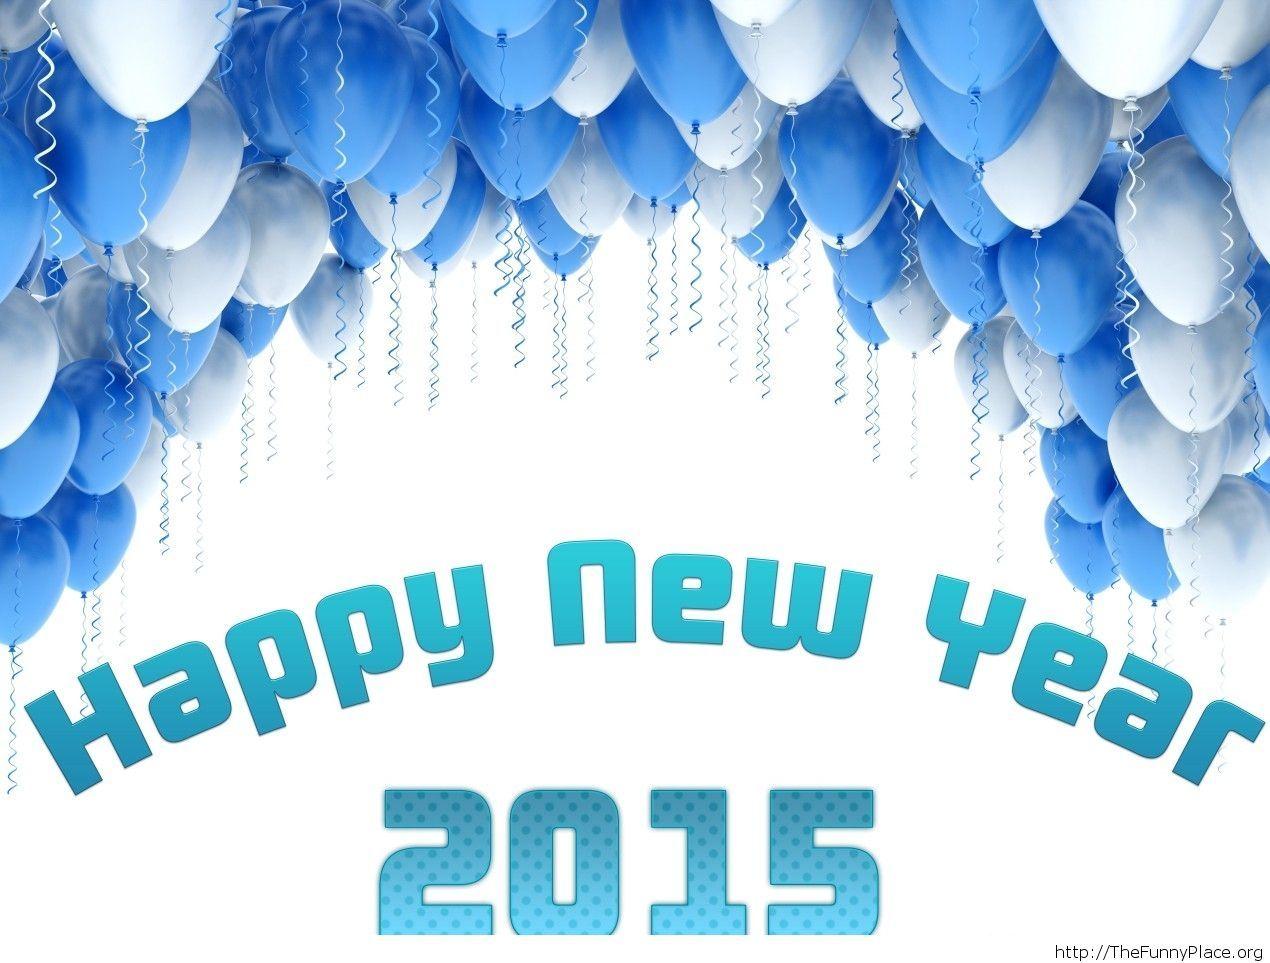 New Year 2015 wallpaper blue balloons